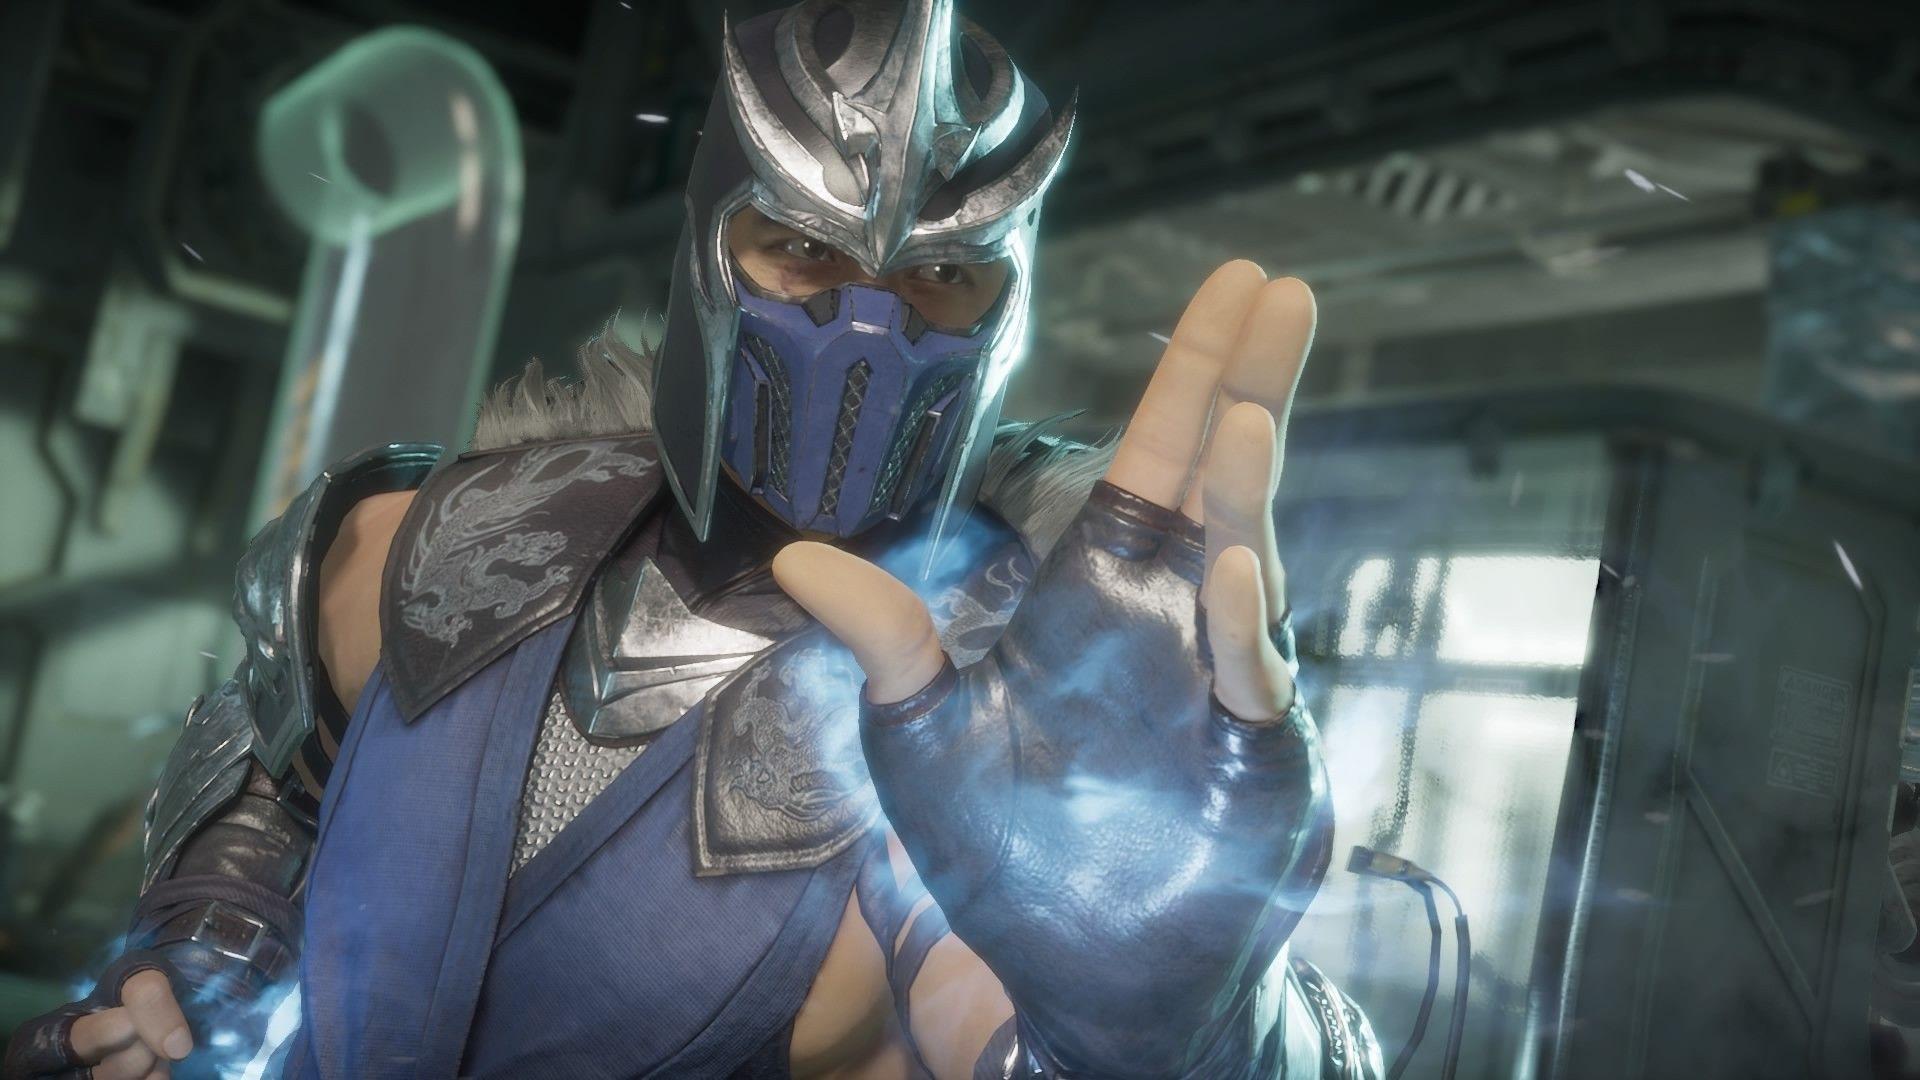 Sub-Zero and Scorpion (split view) | Mortal kombat